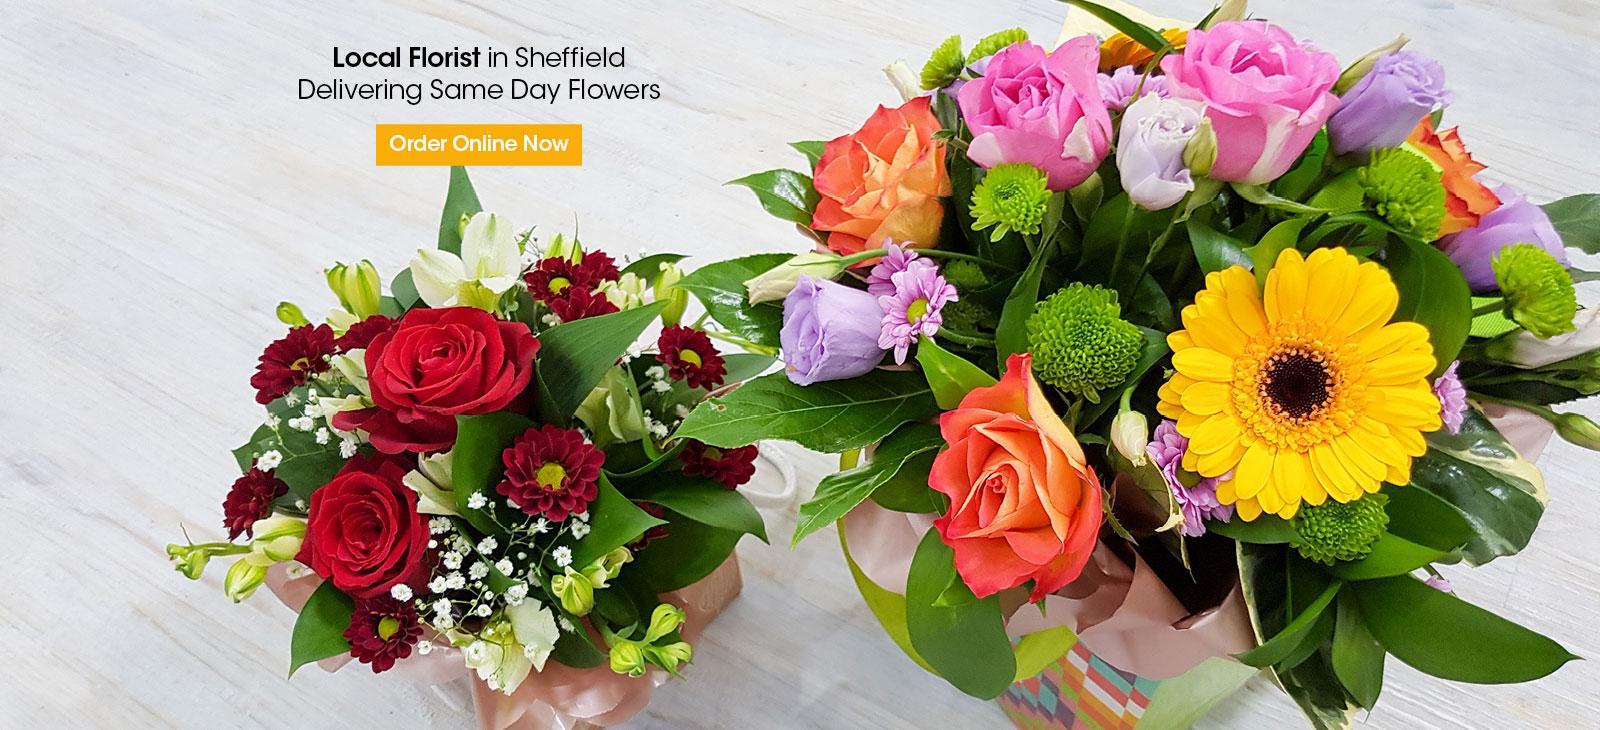 Blooms florist sheffield flower delivery sheffield t 0114 235 9909 welcome to blooms florist sheffield izmirmasajfo